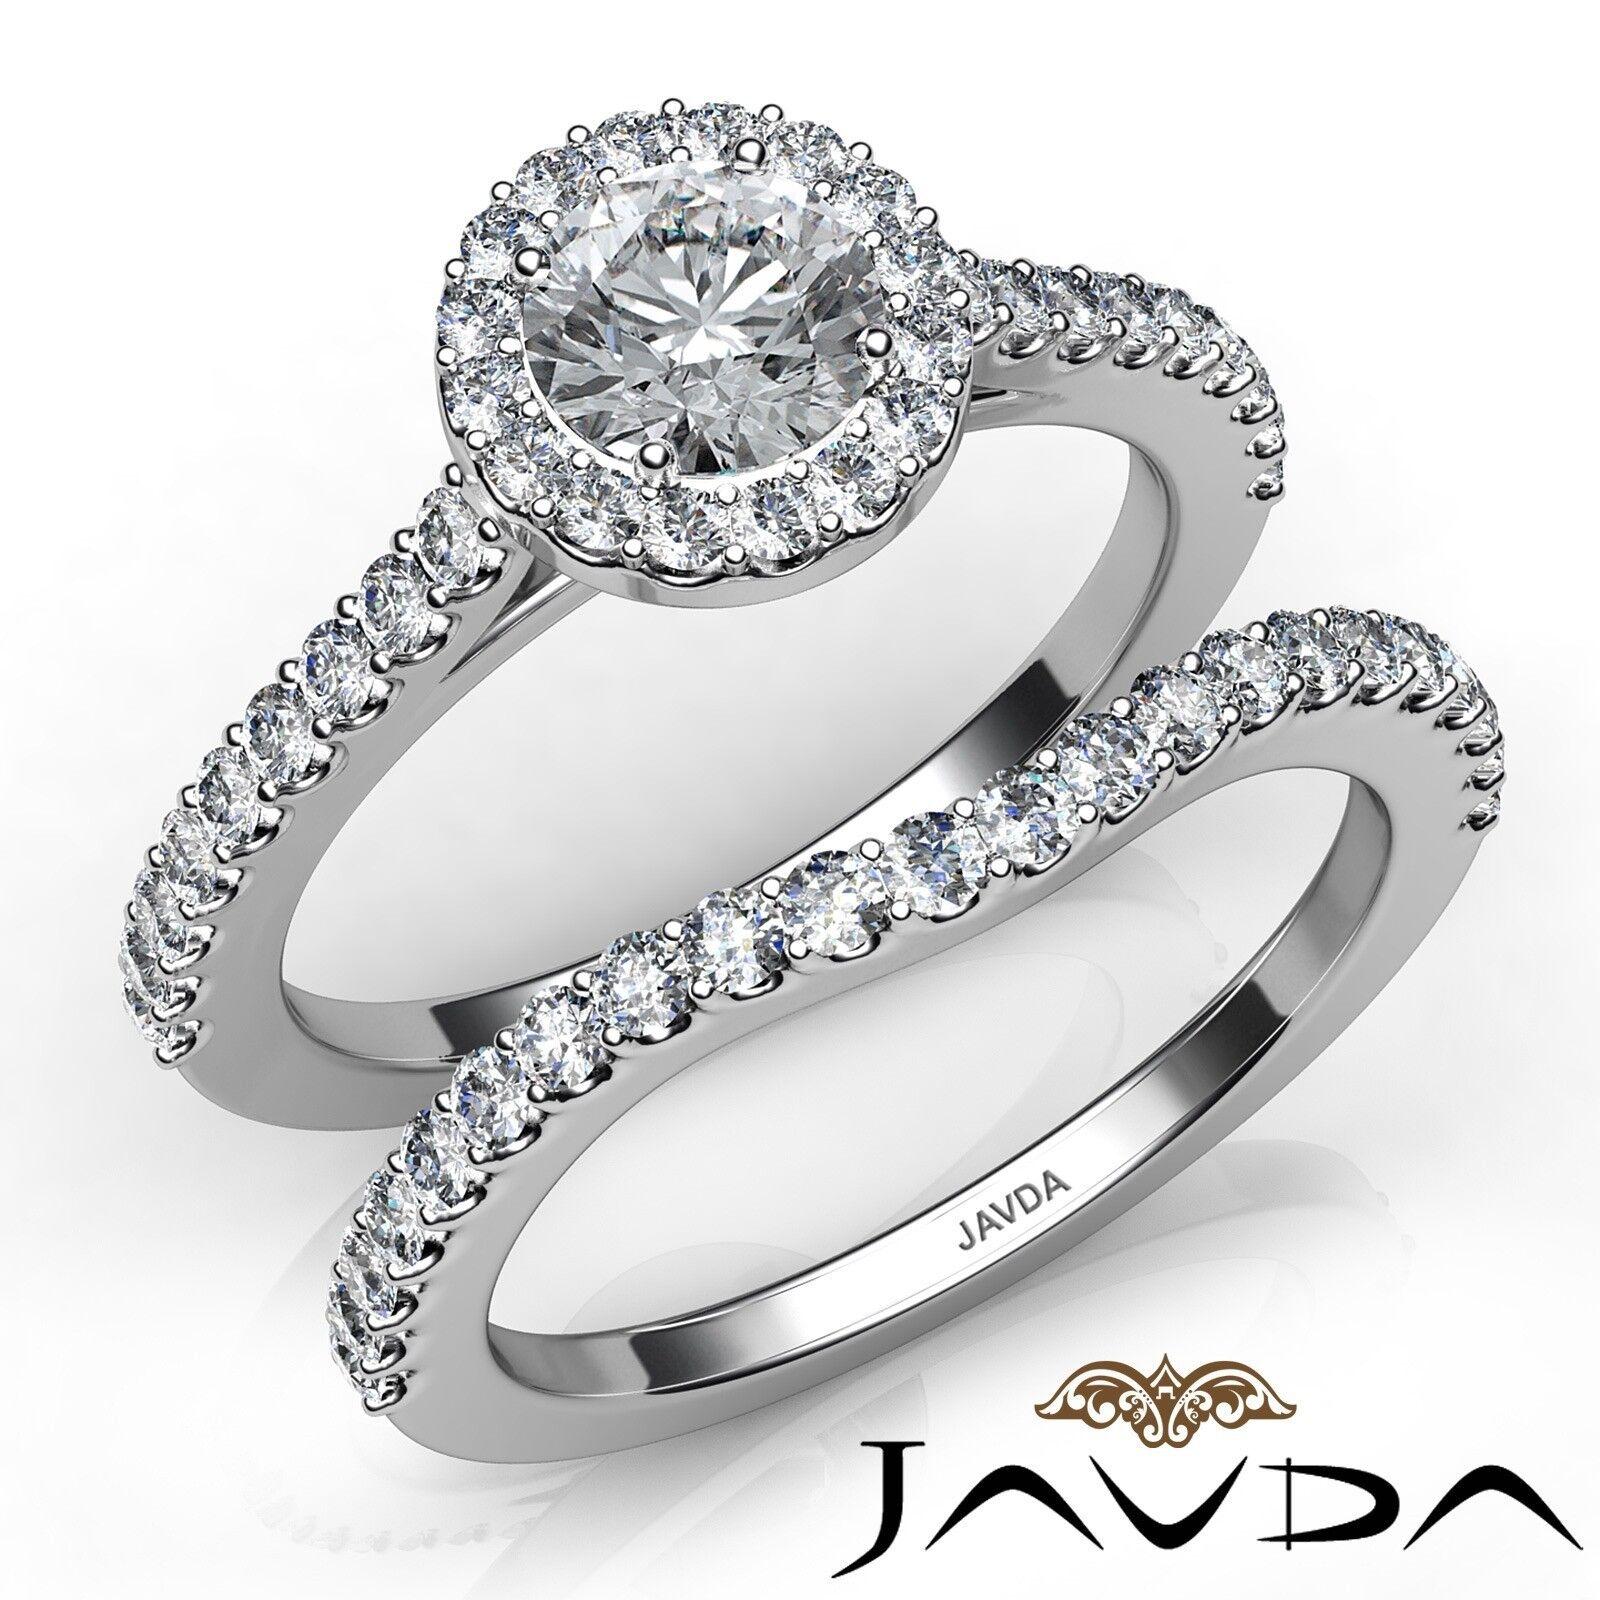 1.5ct U Cut Prong Halo Bridal Set Round Diamond Engagement Ring GIA G-VS1 W Gold